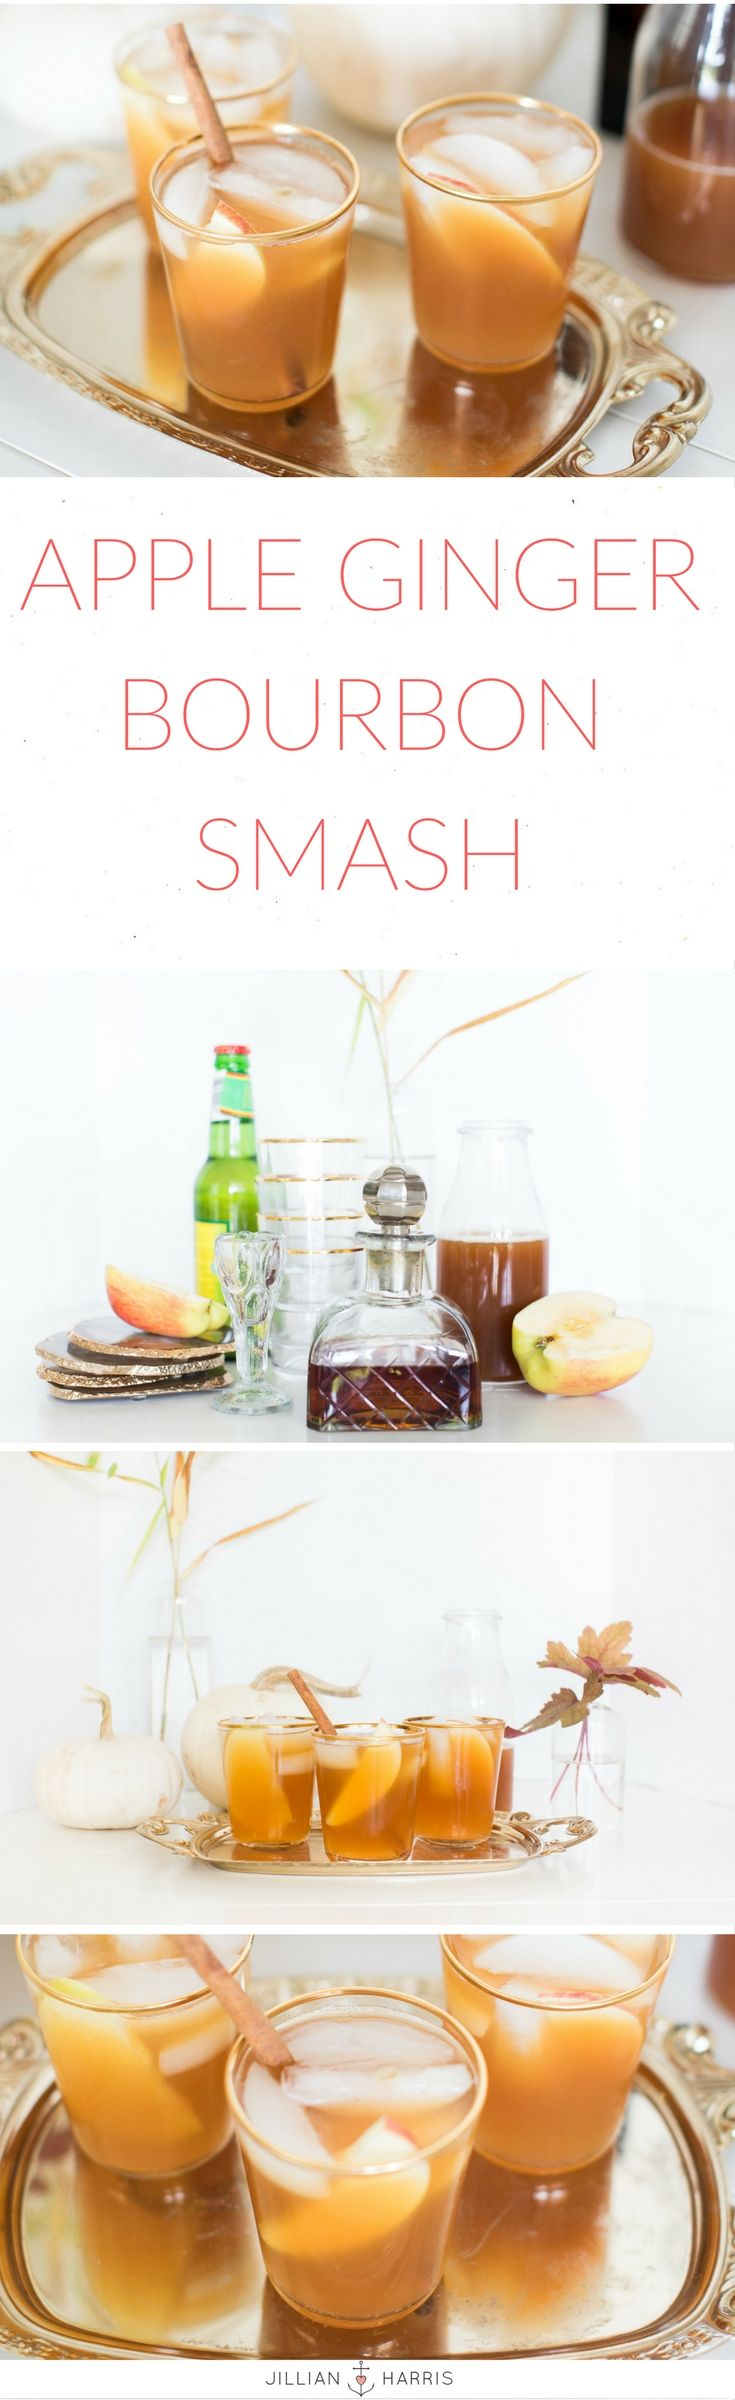 Jillian Harris Apple Ginger Bourbon Smash Cocktail Recipe